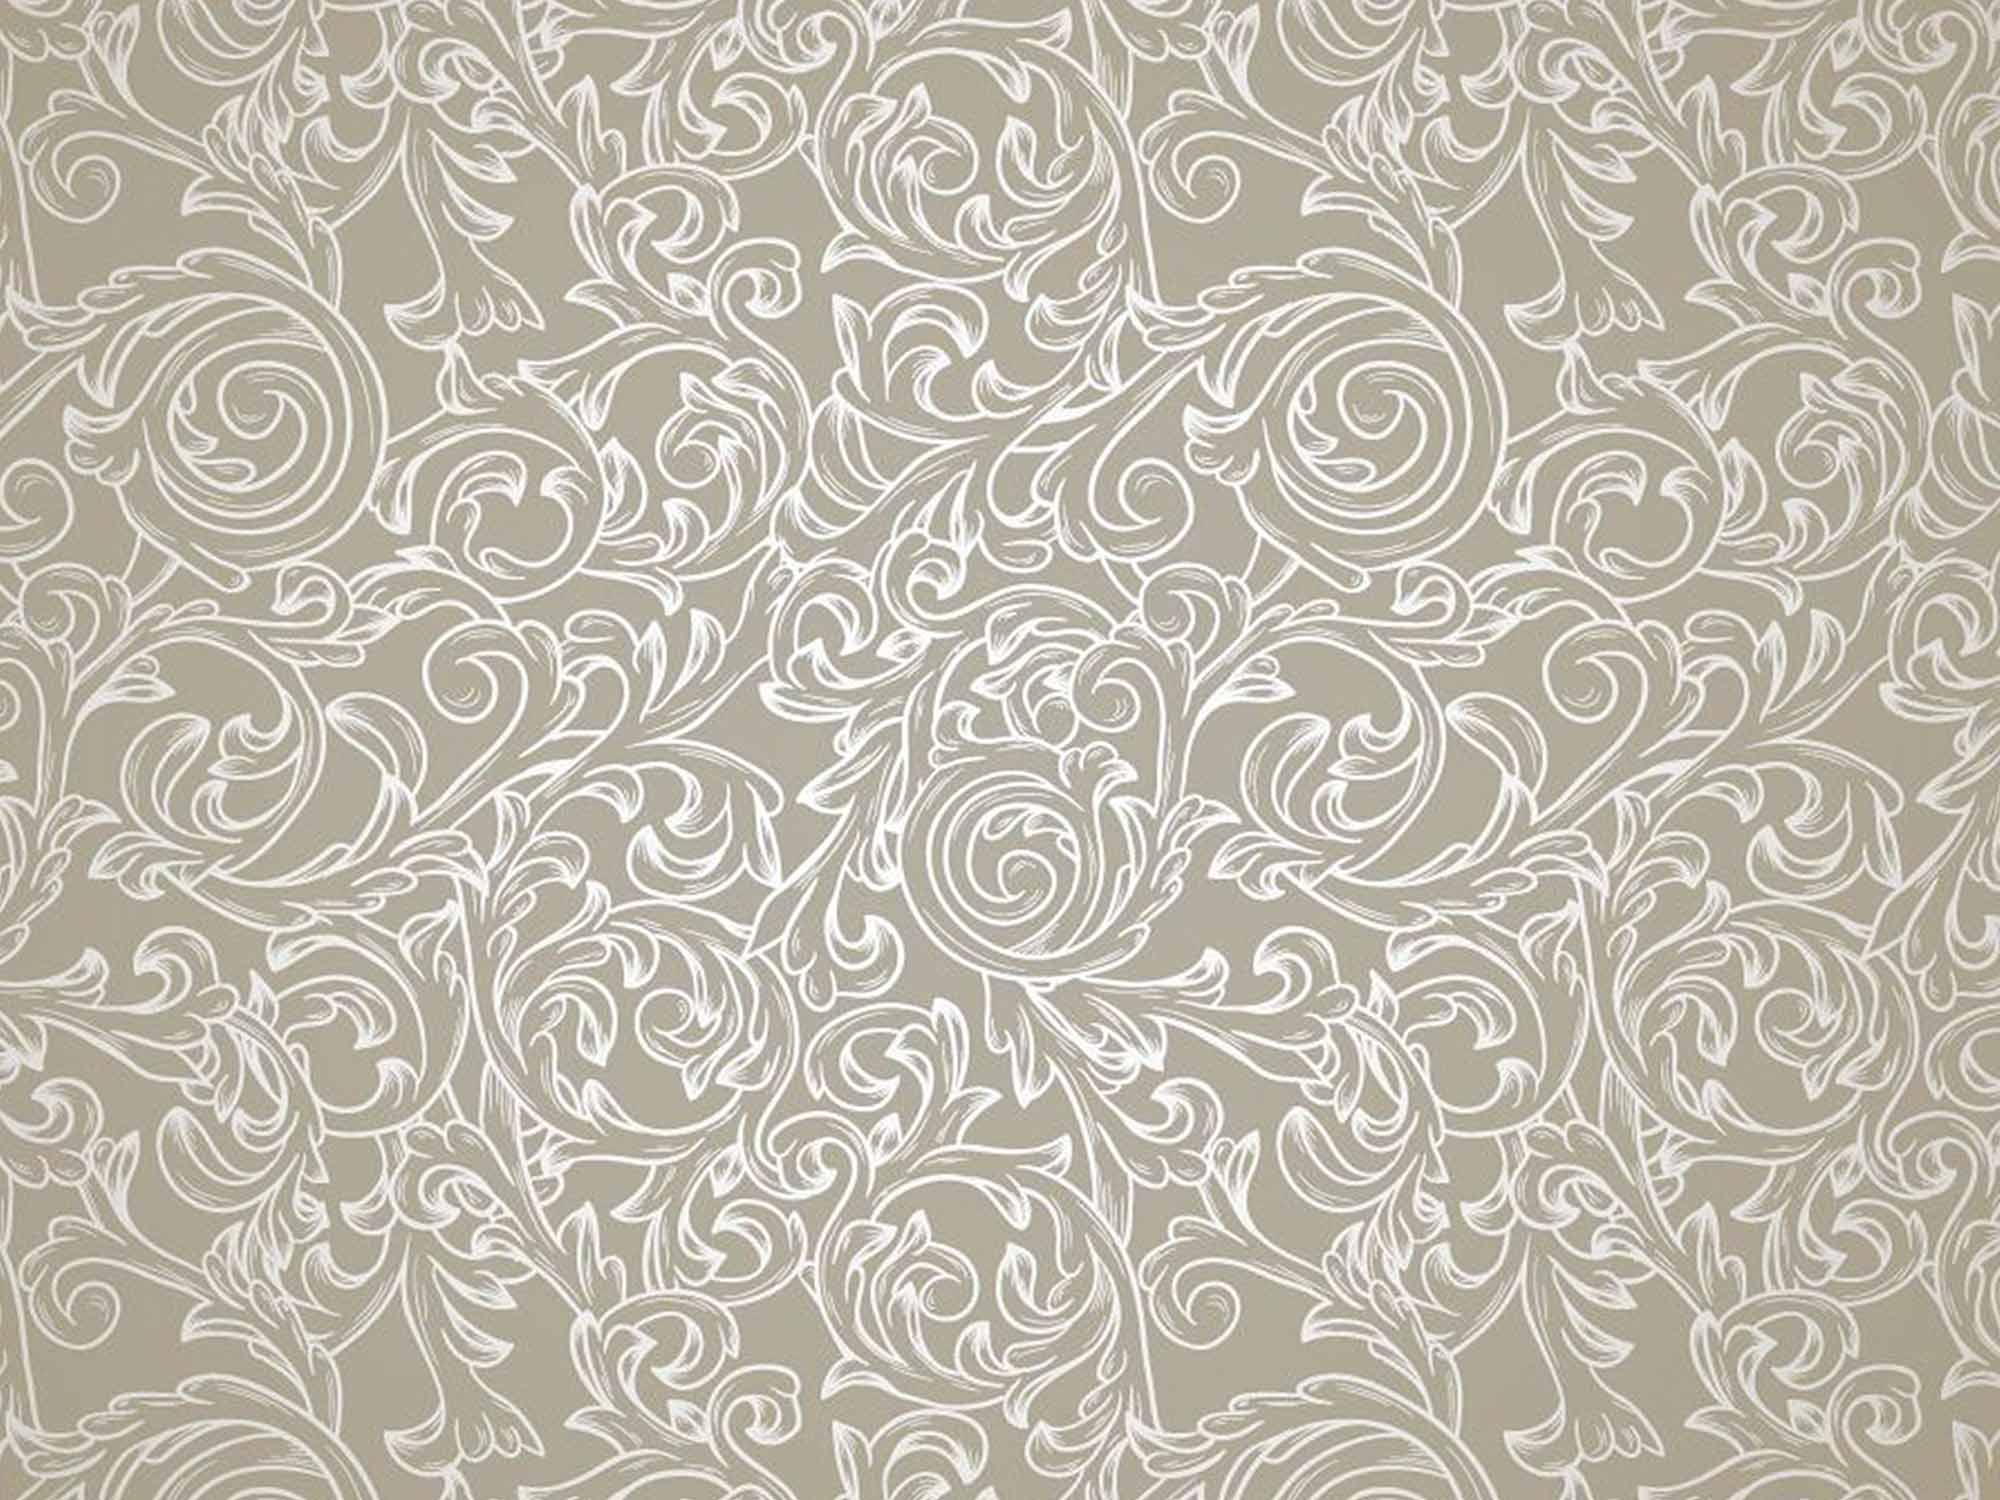 Papel de Parede para Sala Arabesco 0021 - Adesivos de Parede  - Paredes Decoradas